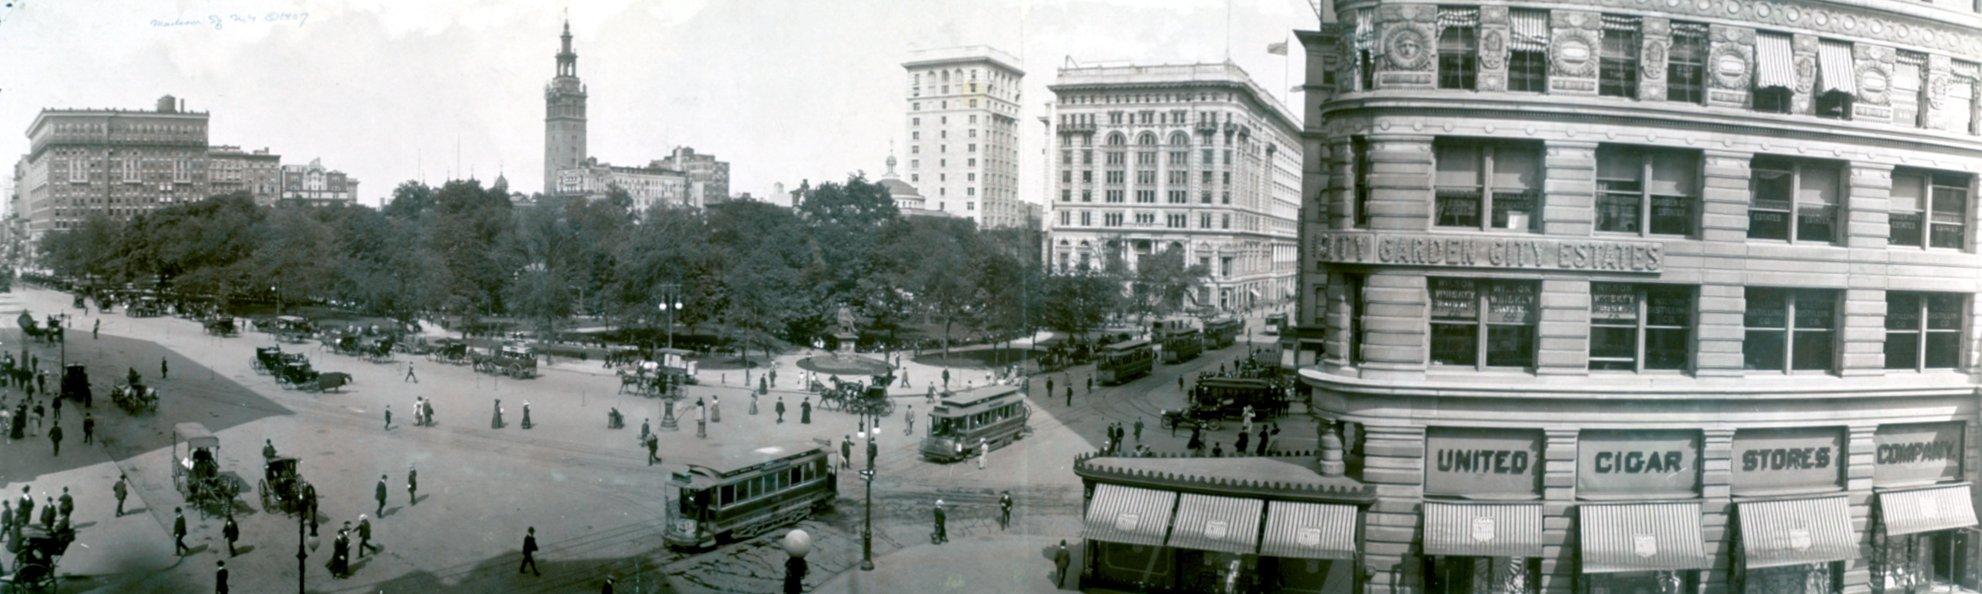 Madison square park in 1908